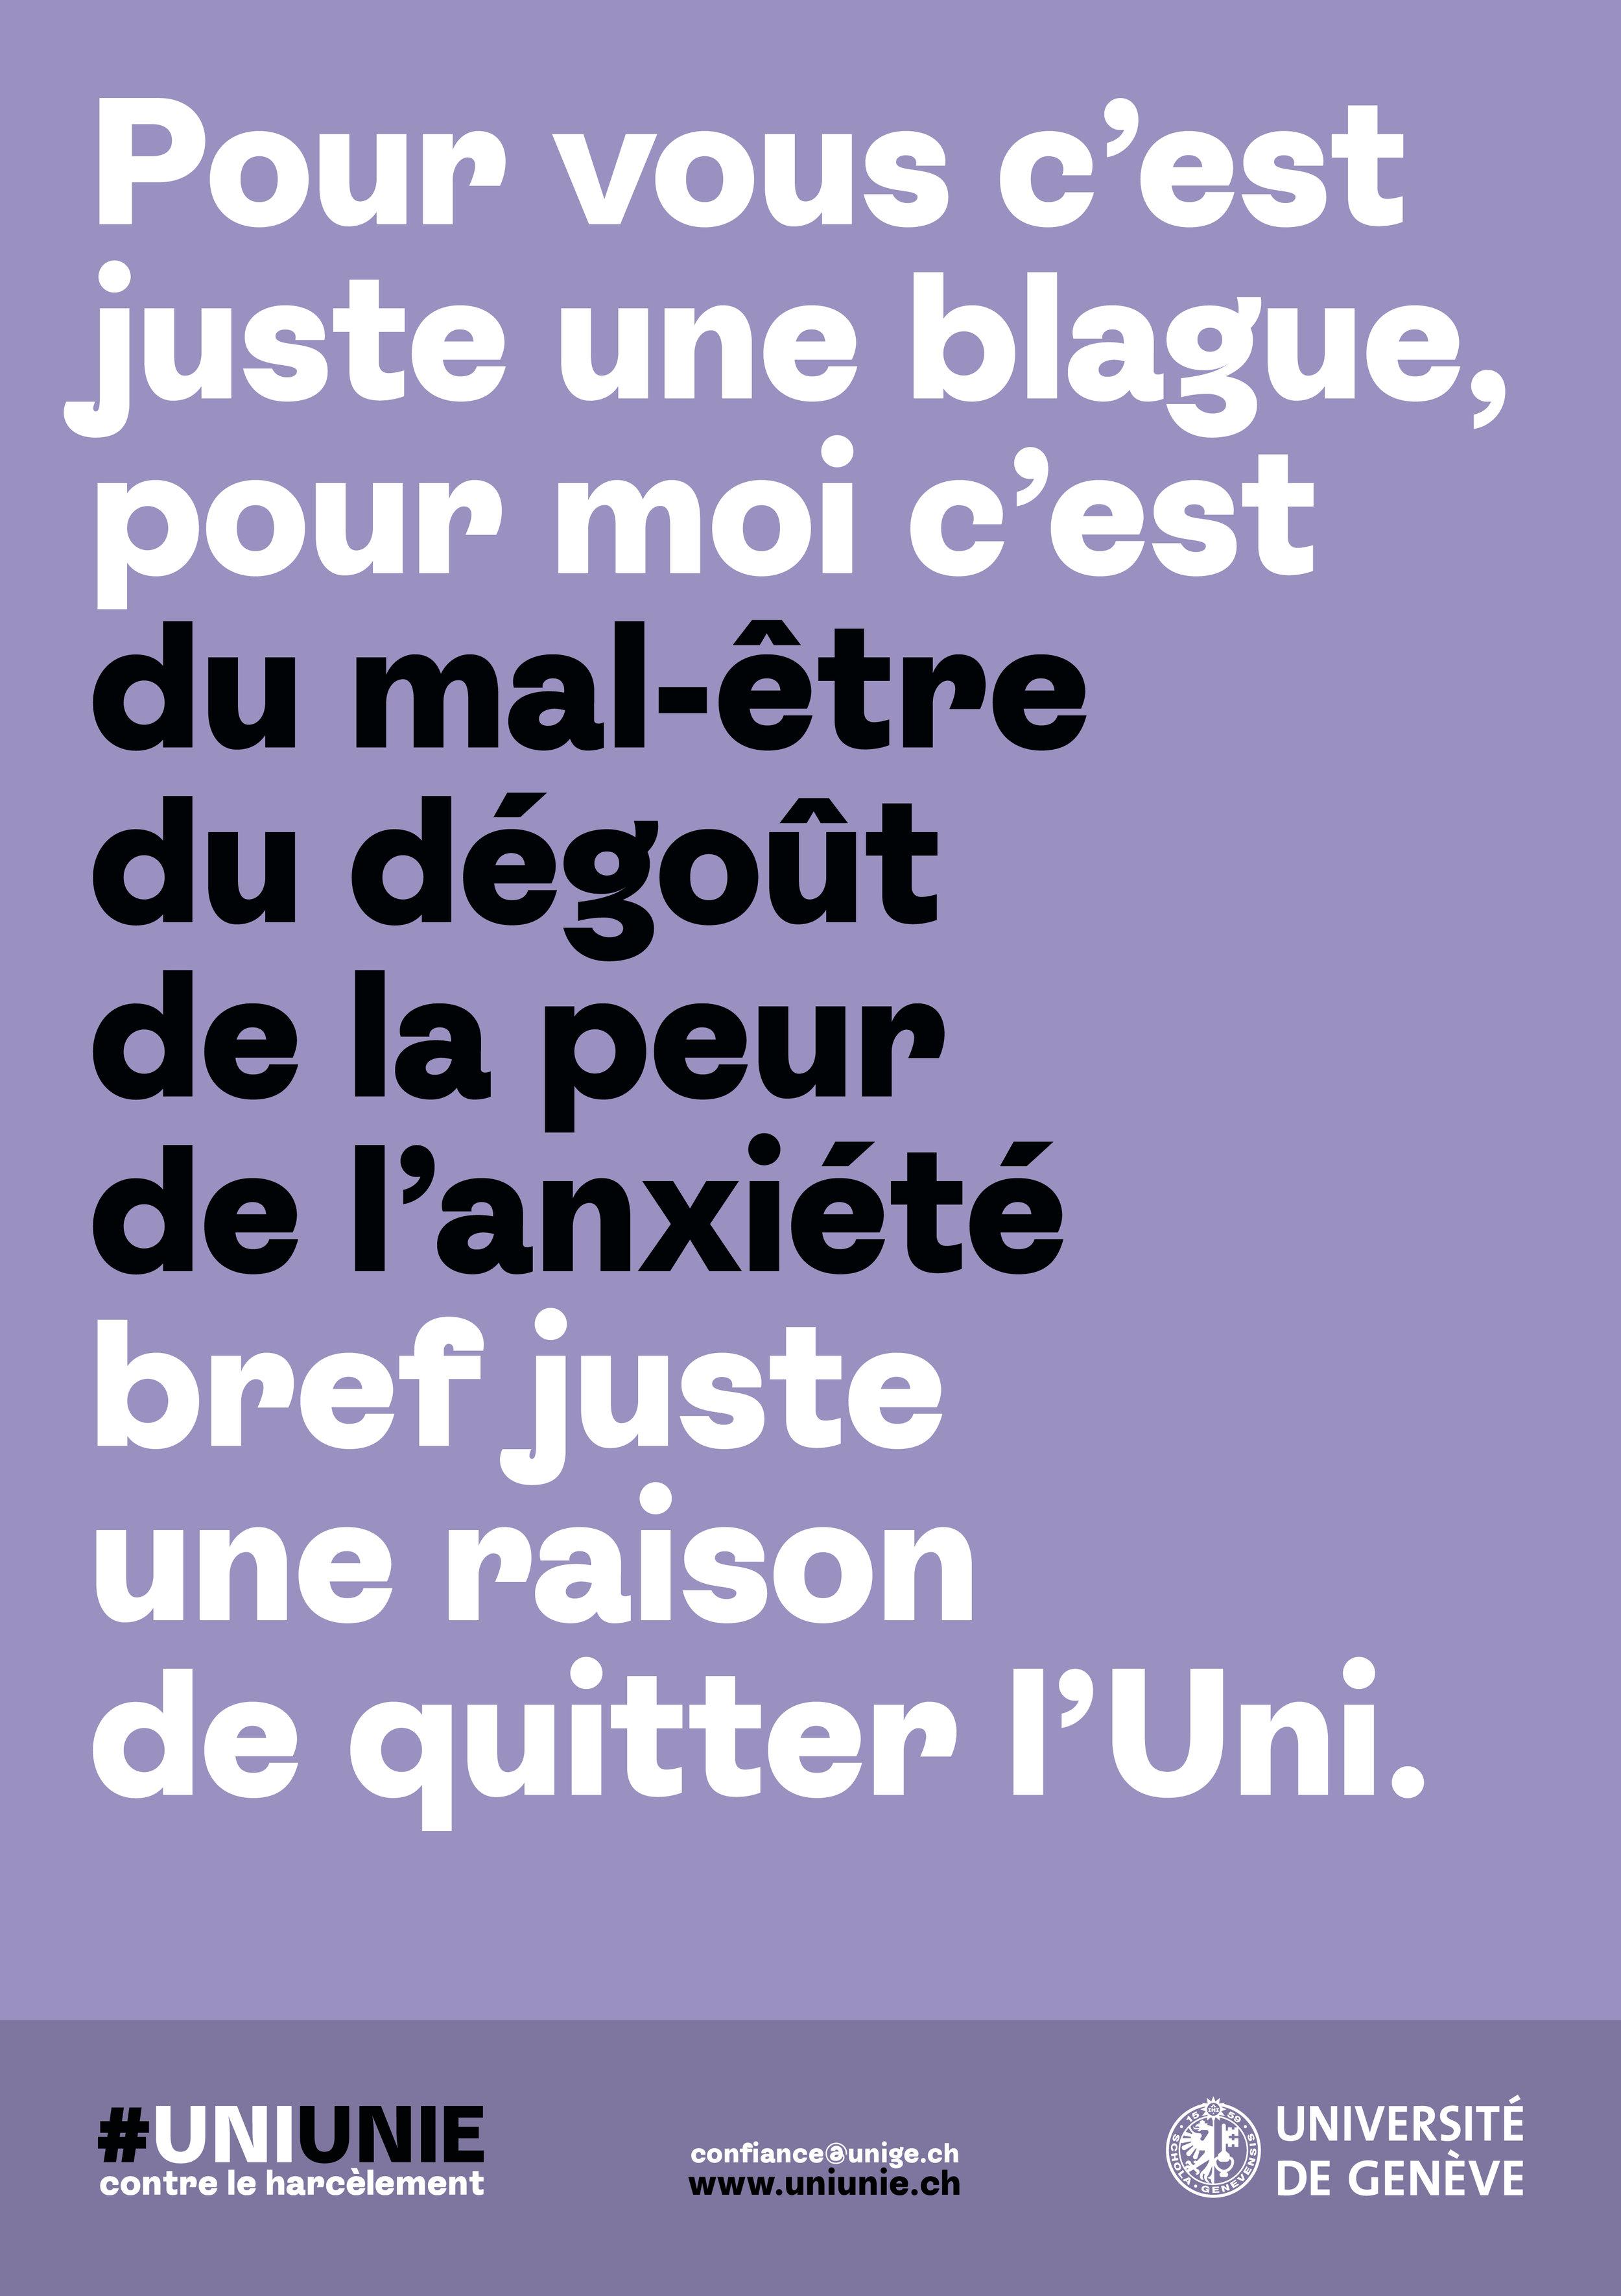 UNIUNIE_affiches6.jpg